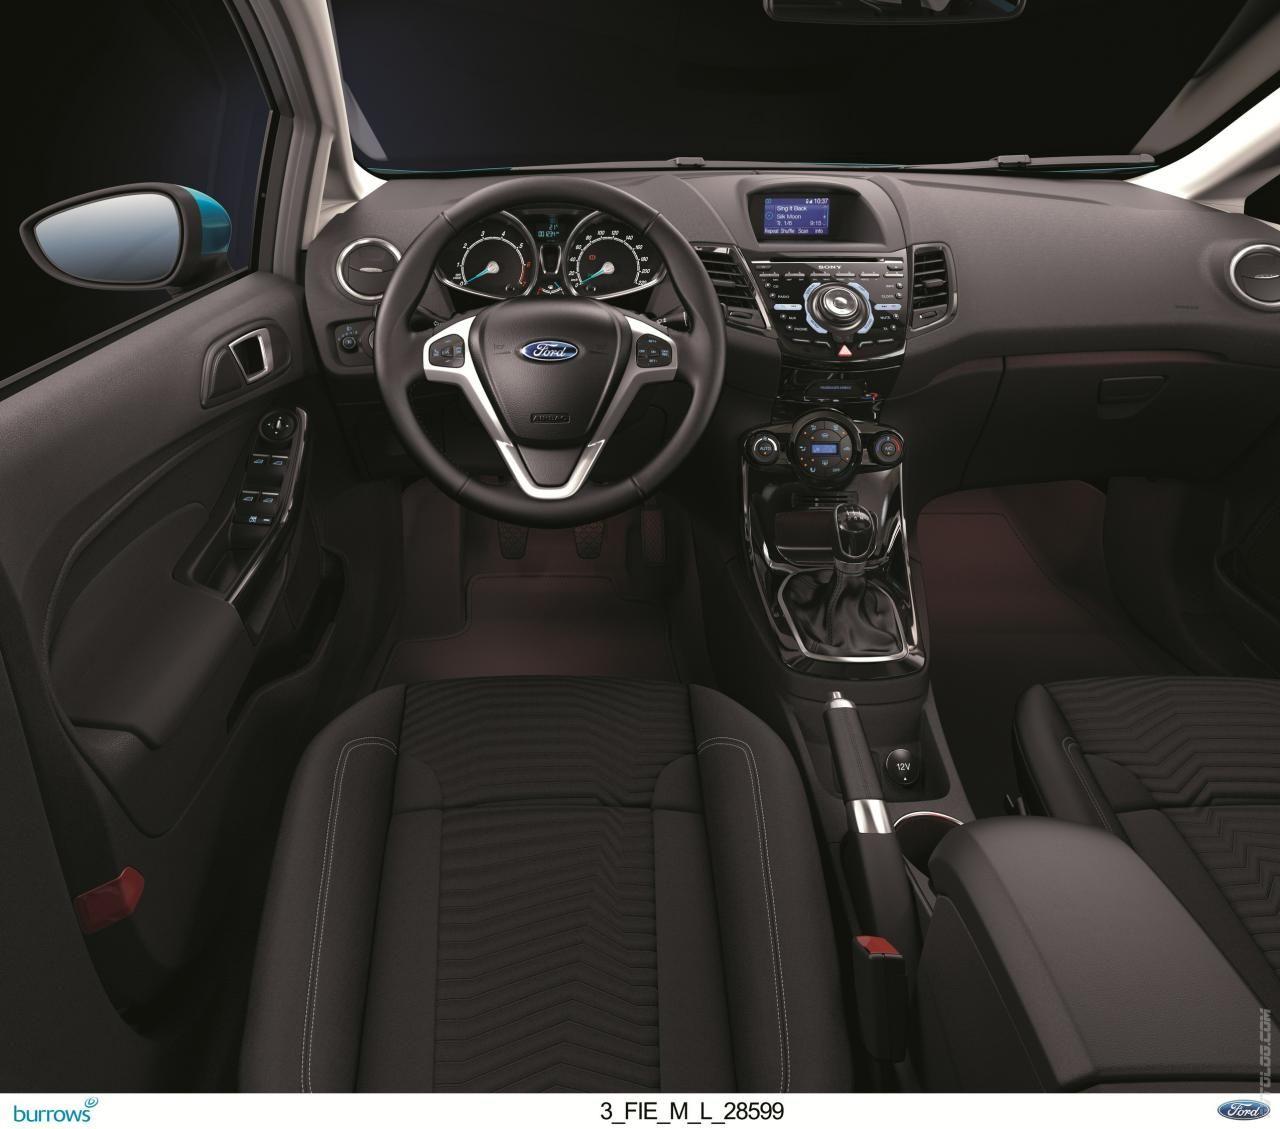 2013 Ford Fiesta Http Palmcoastford Com Flagler County Dealer